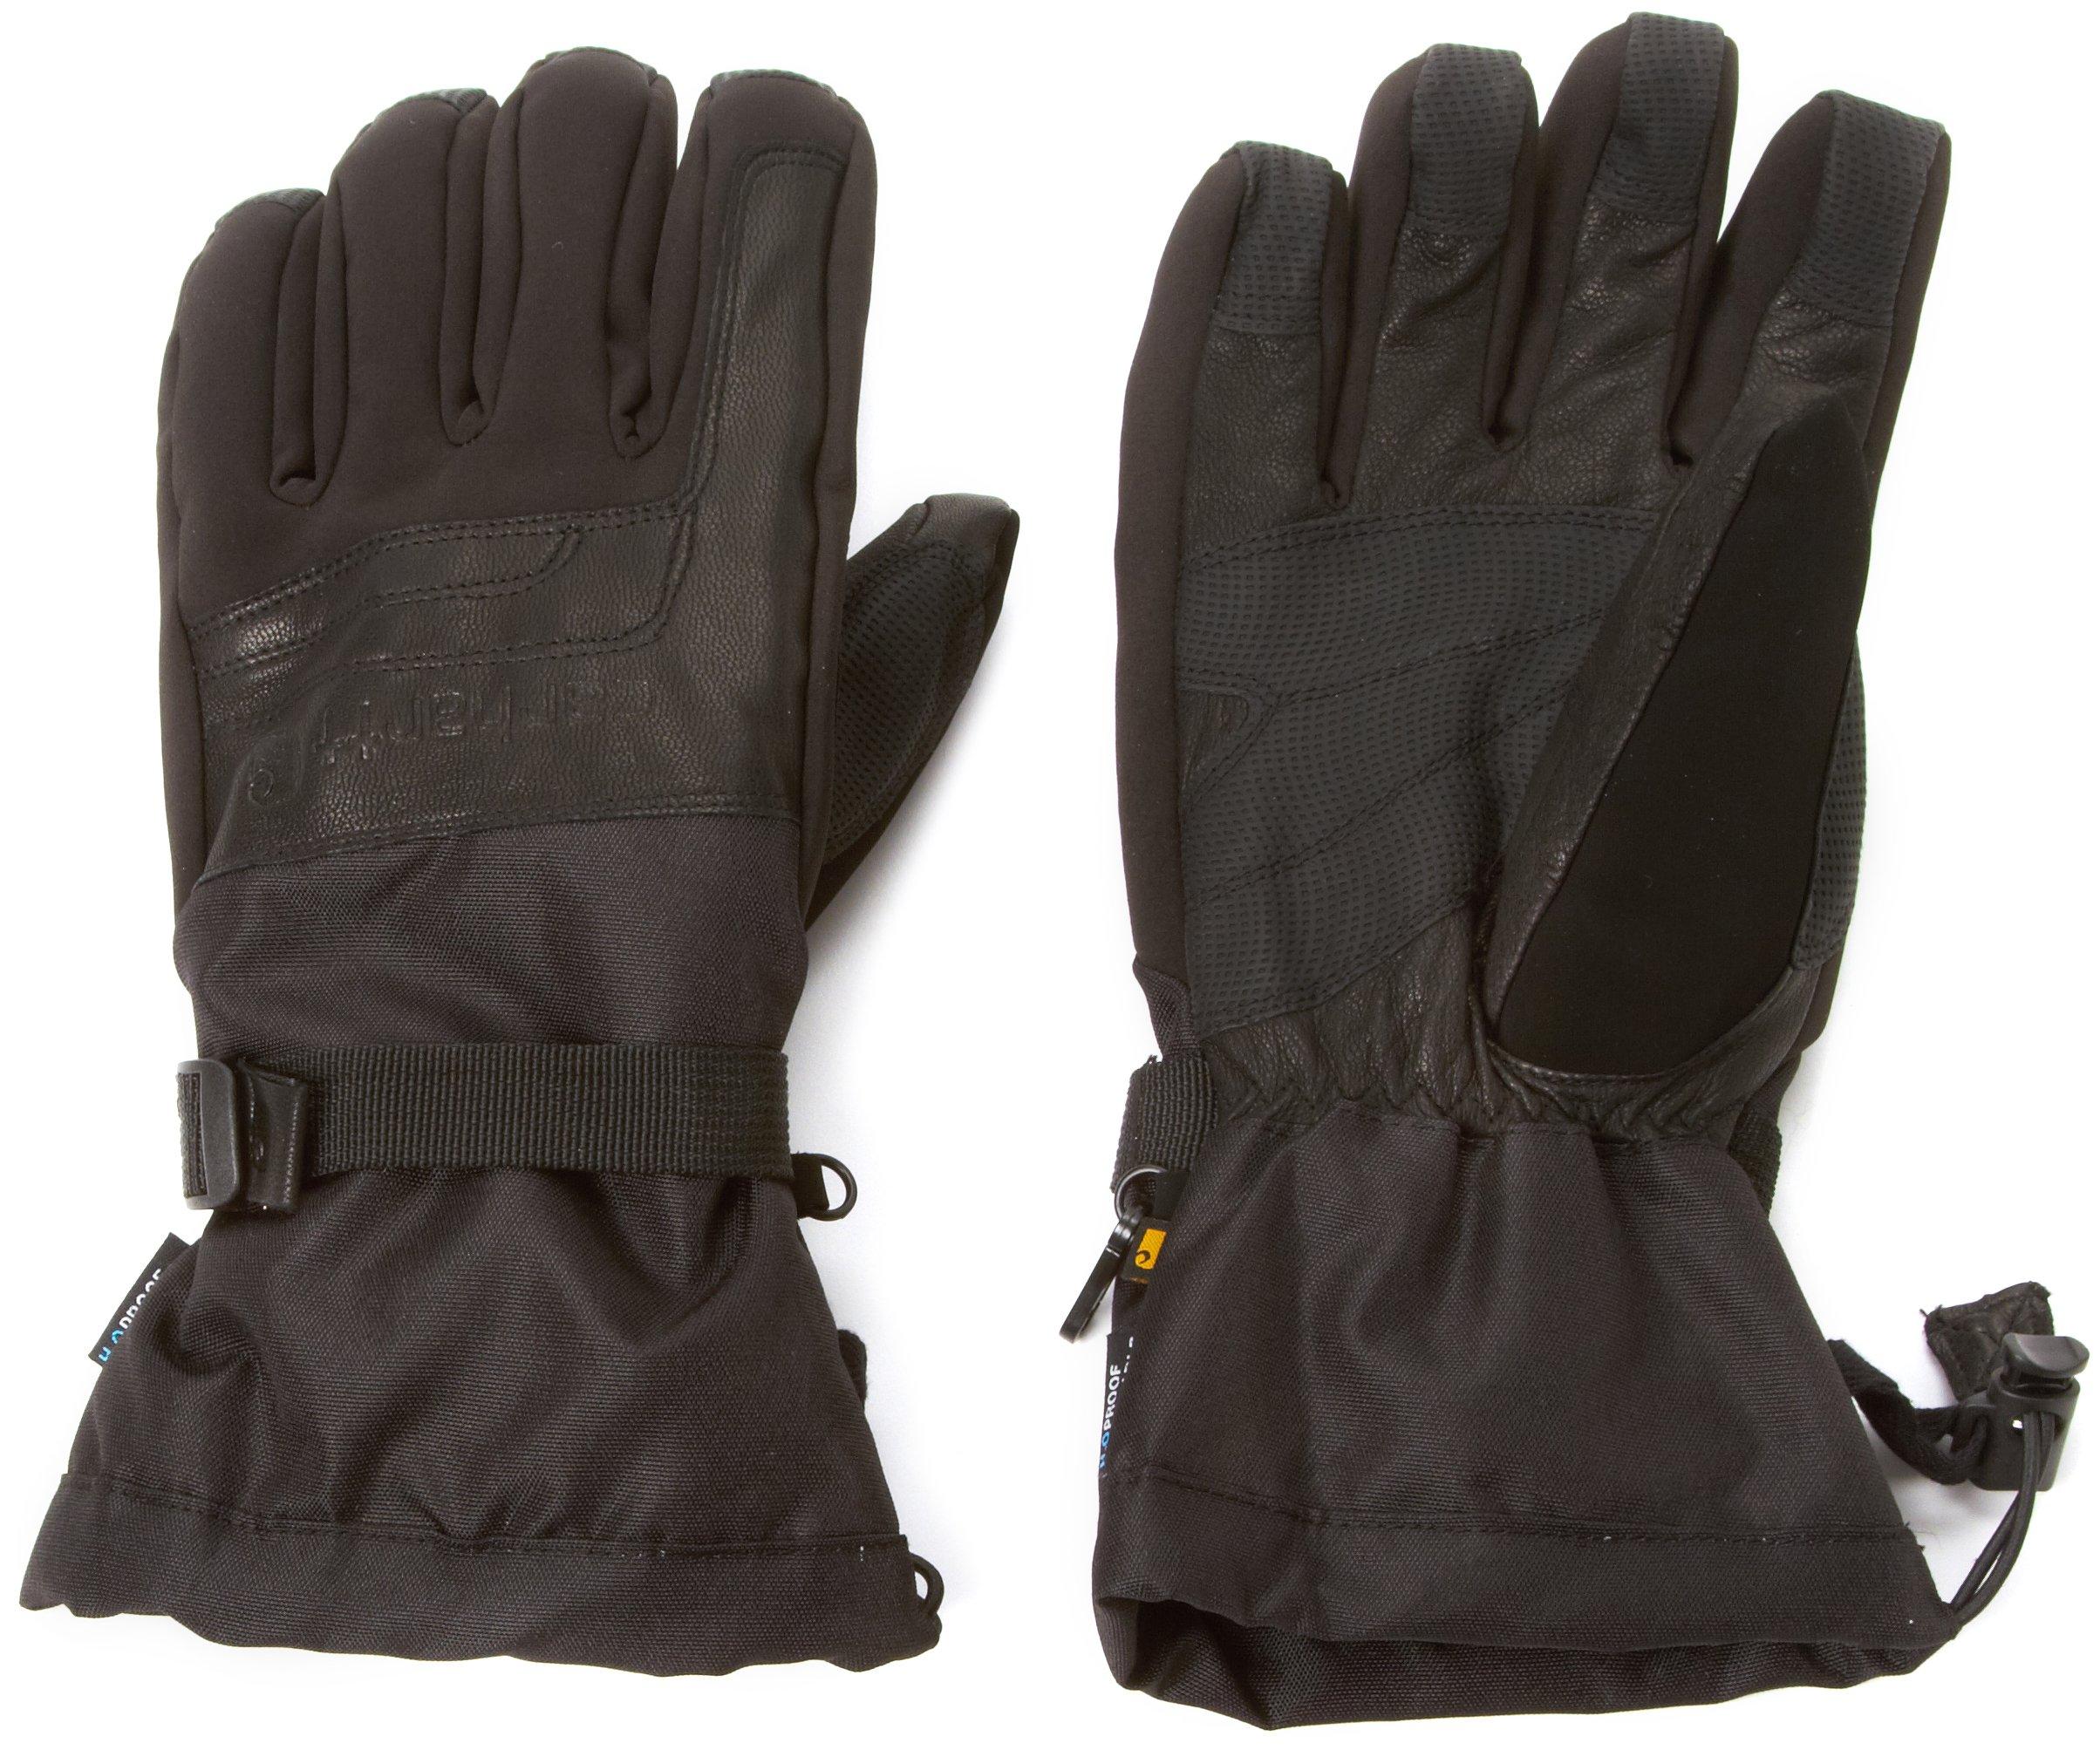 Carhartt Men's Cold Snap Insulated Work Glove, Black, Medium